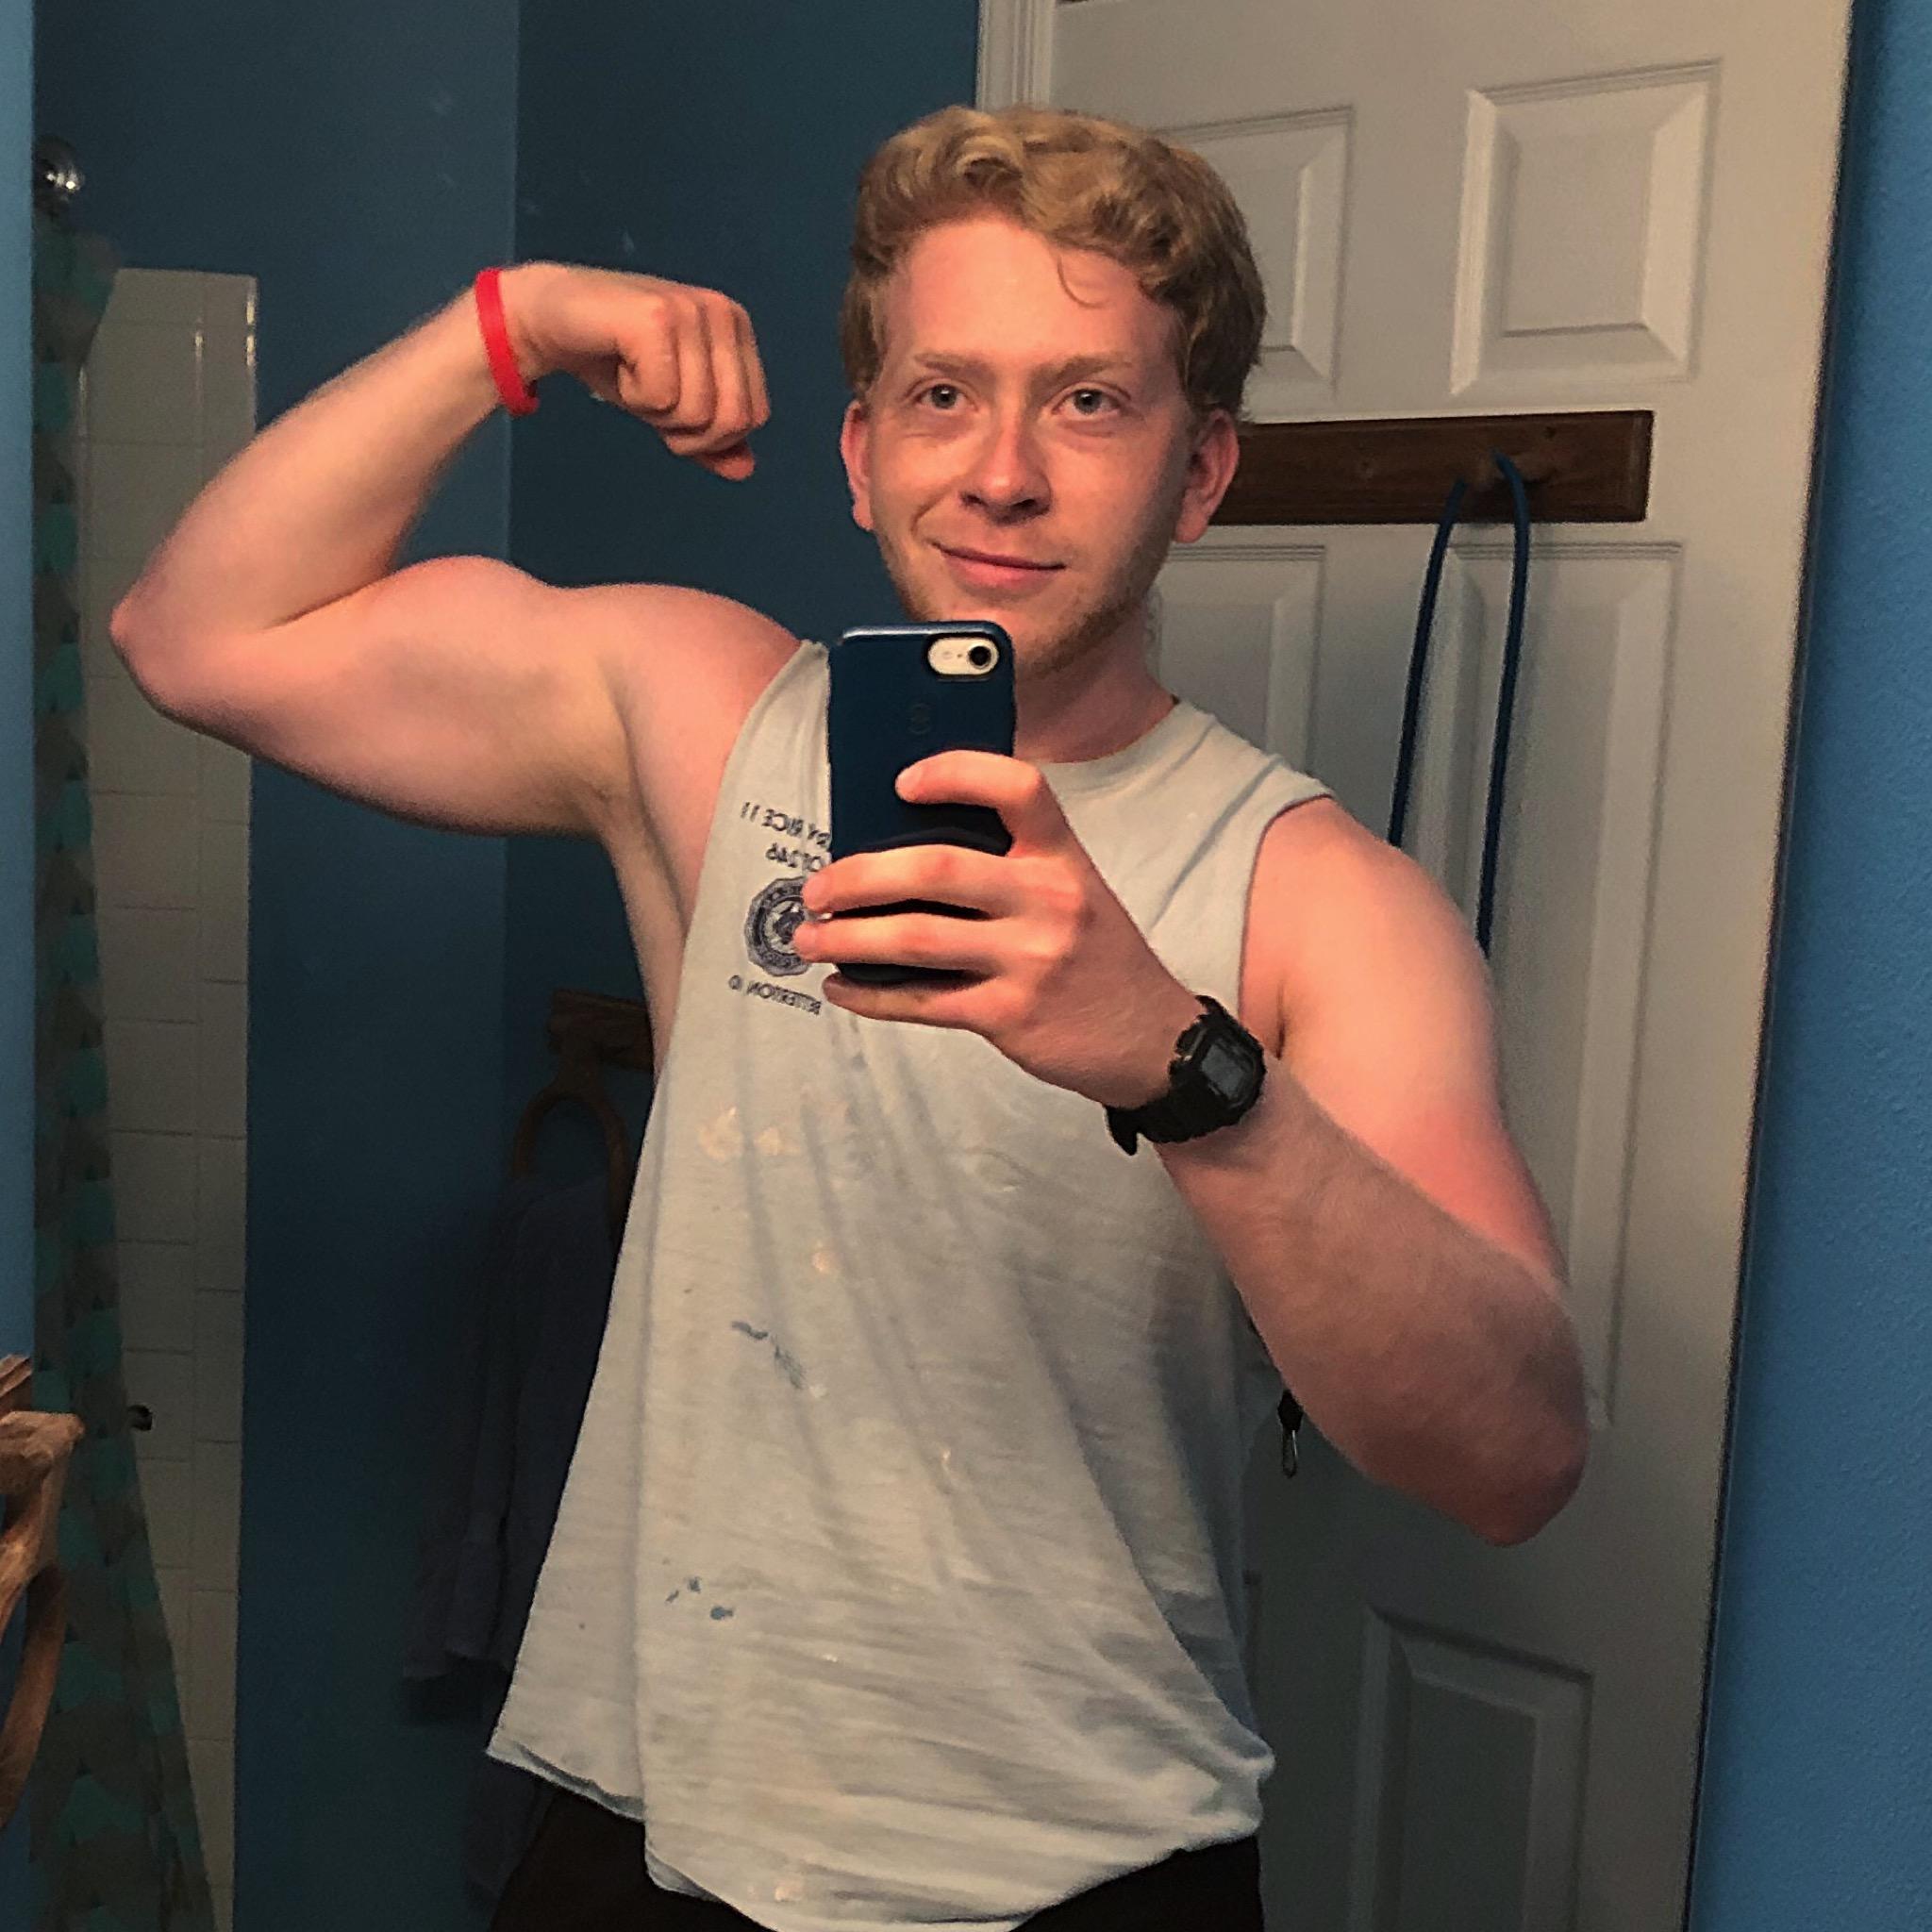 Myself flexing my biceps